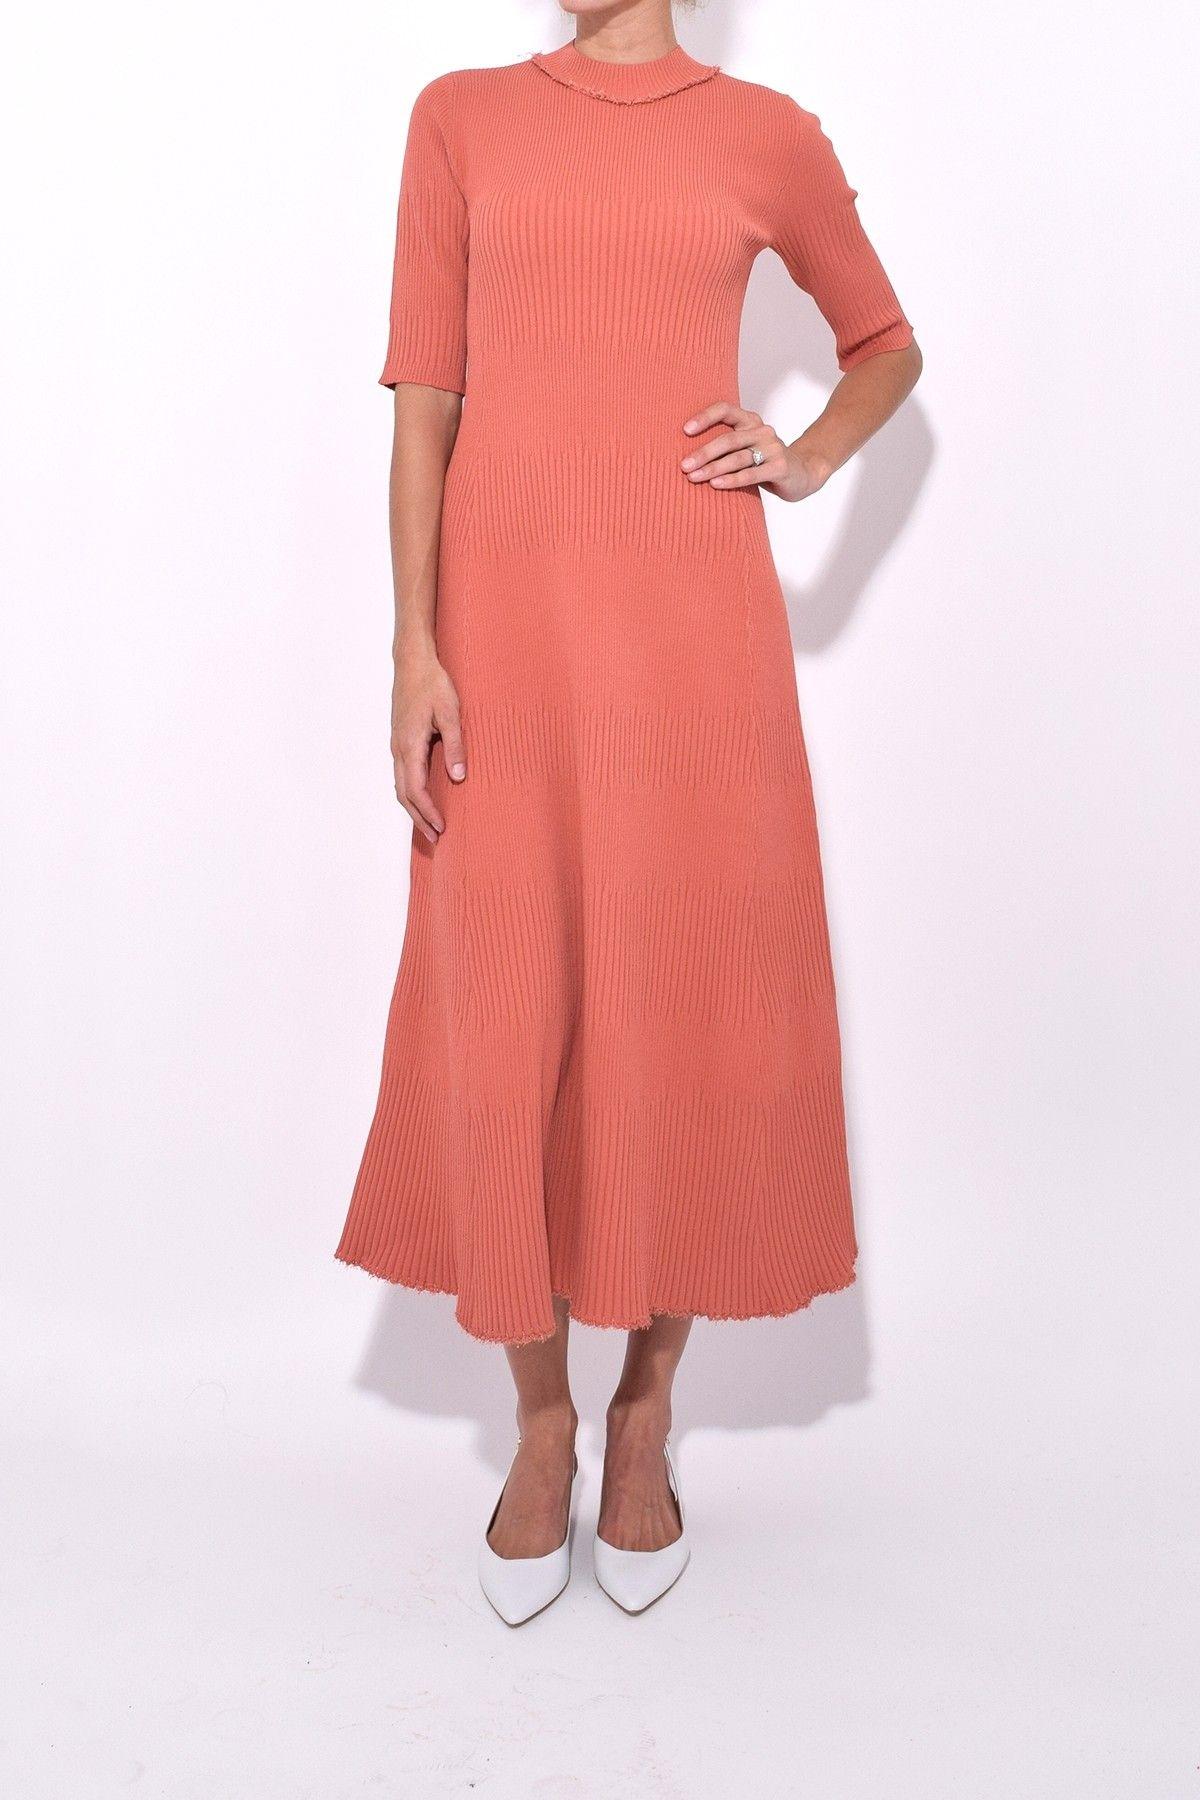 Proenza Schouler Short Sleeve Knit Dress In Desert Knit Dress Dresses Vintage Fashion [ 1800 x 1200 Pixel ]